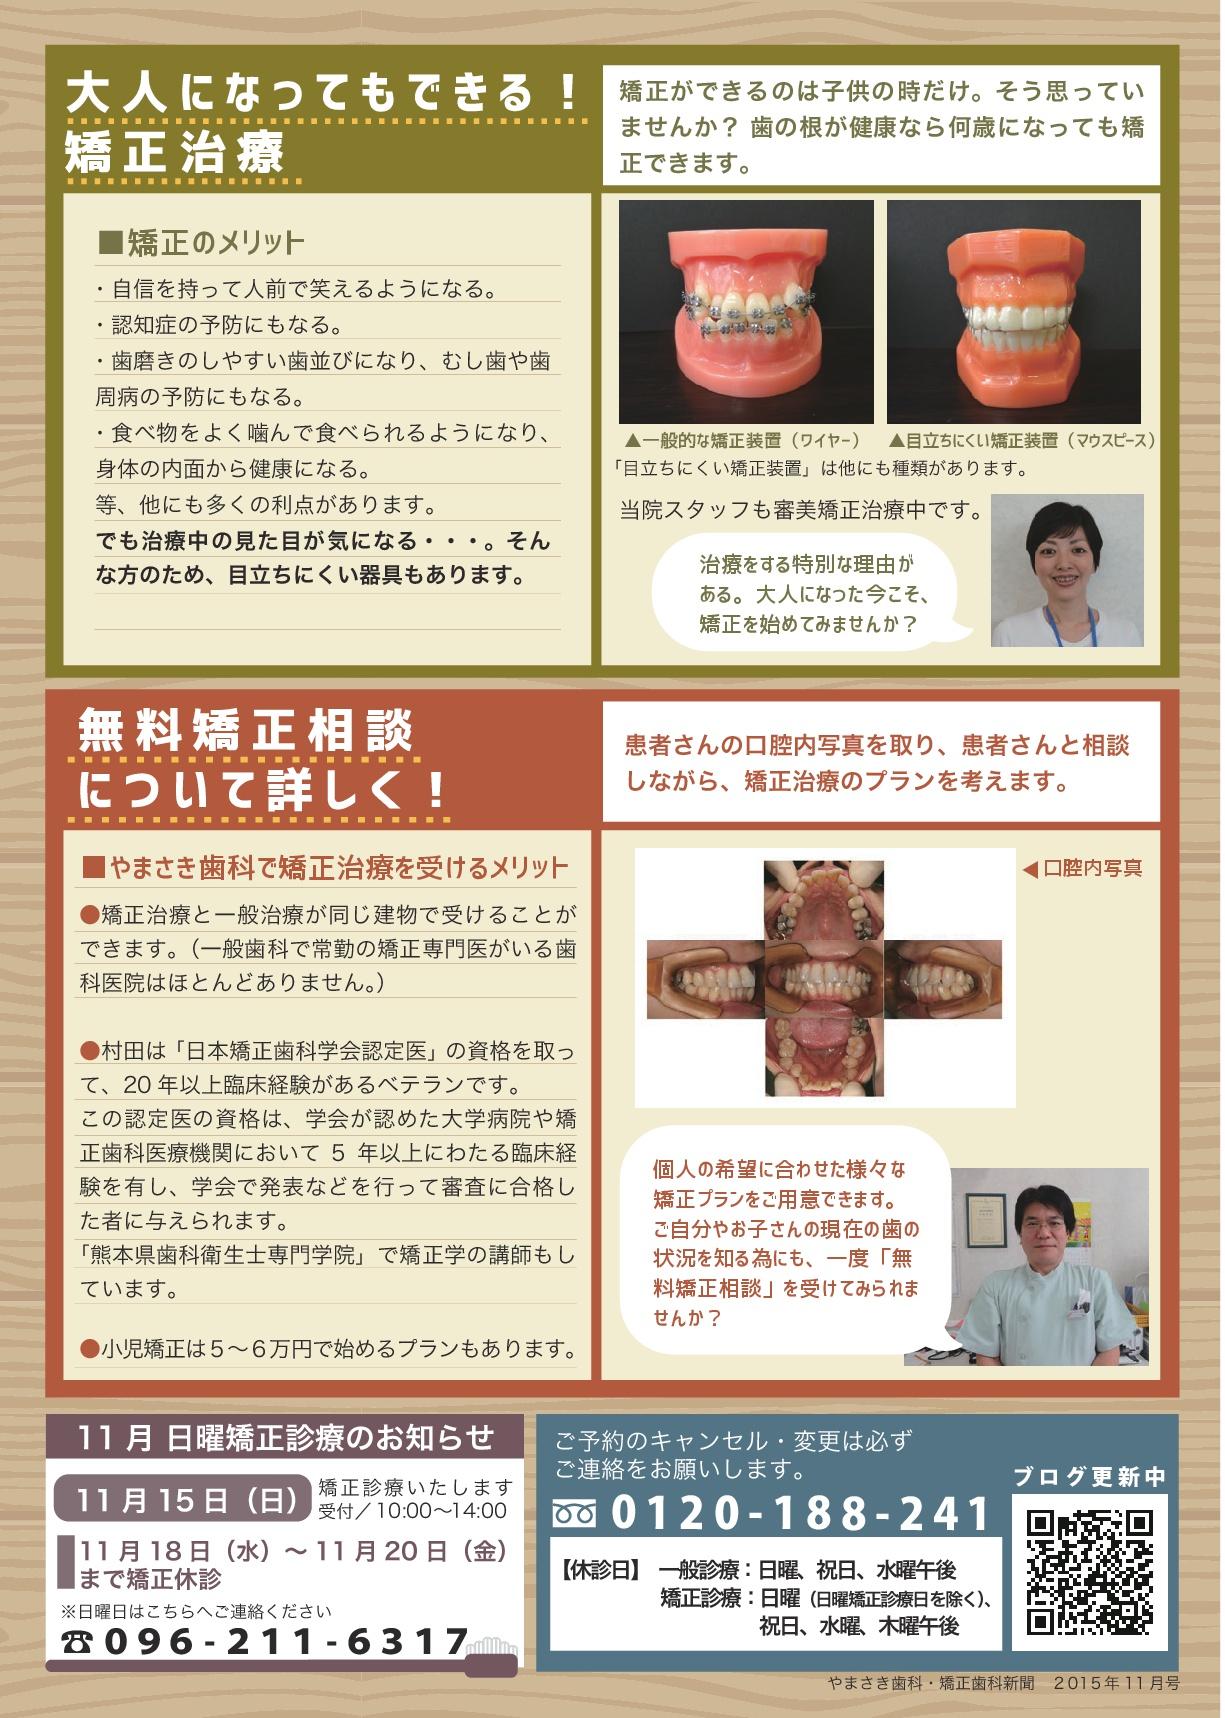 sinbun15-11-2-001